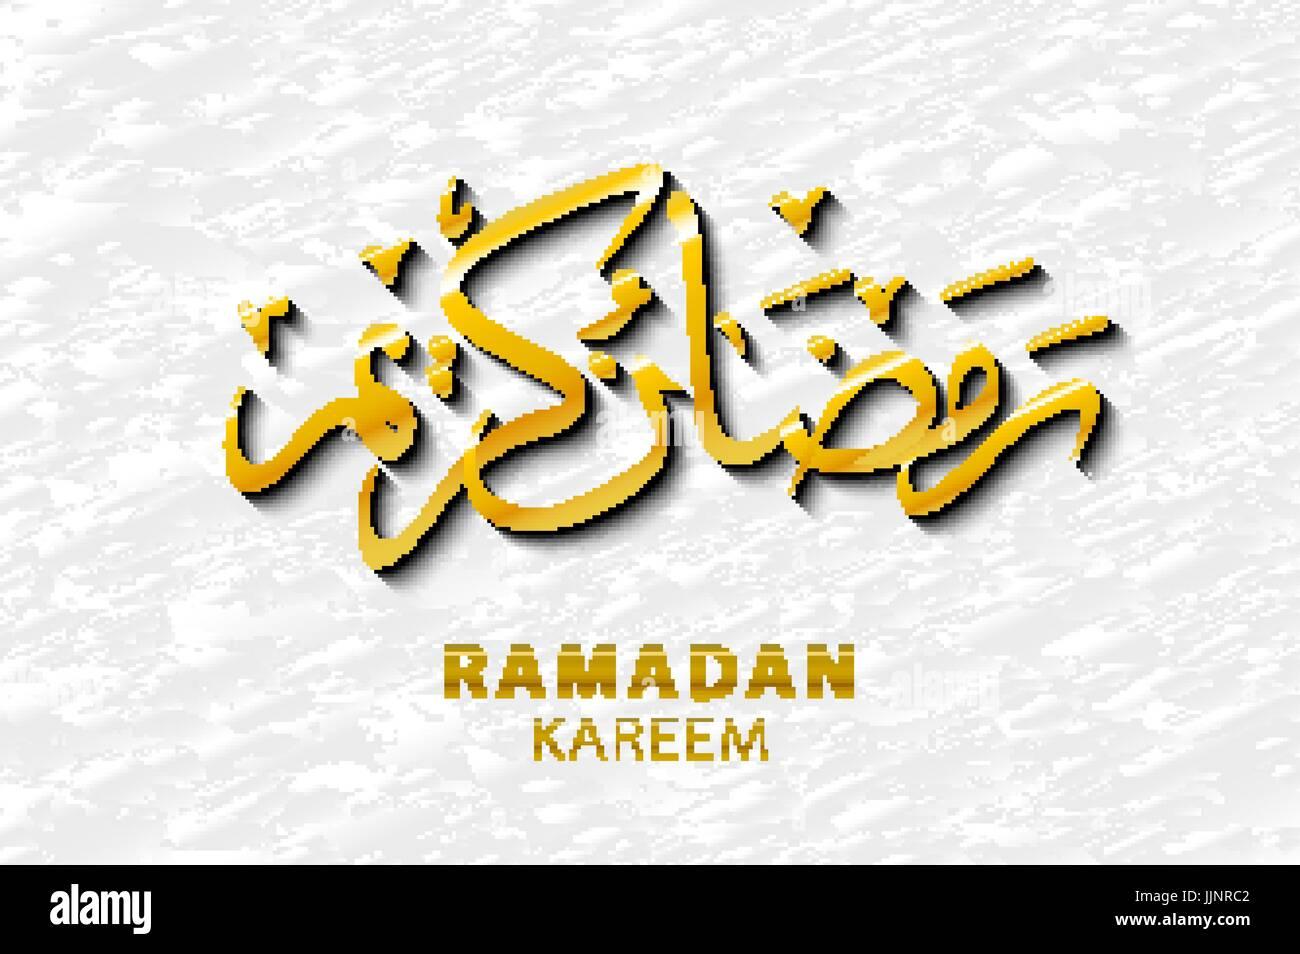 Ramadan greetings in arabic script an islamic greeting card for ramadan greetings in arabic script an islamic greeting card for holy month of ramadan kareem translation generous ramadhan art kristyandbryce Images